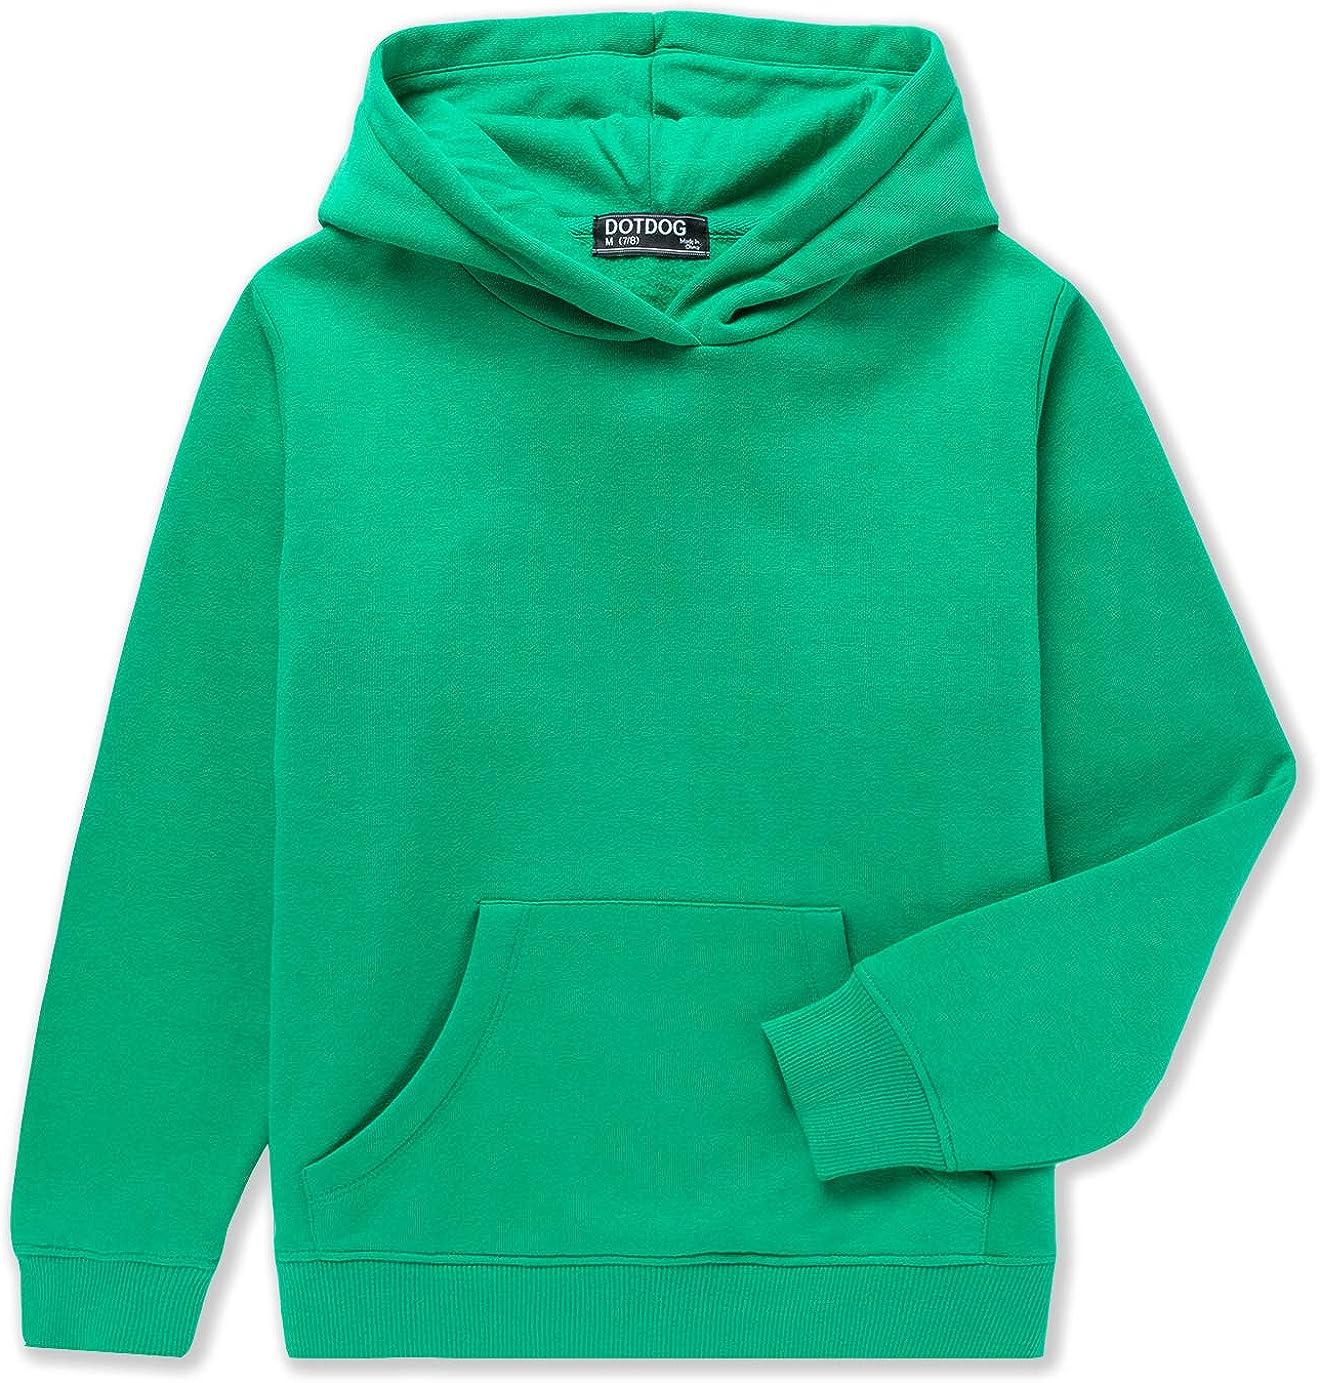 DOTDOG Unisex Kids Soft Brushed Fleece Pullover Hooded Sweatshirt Classic Casual Hoodie for Boys or Girls (3-12 Years)